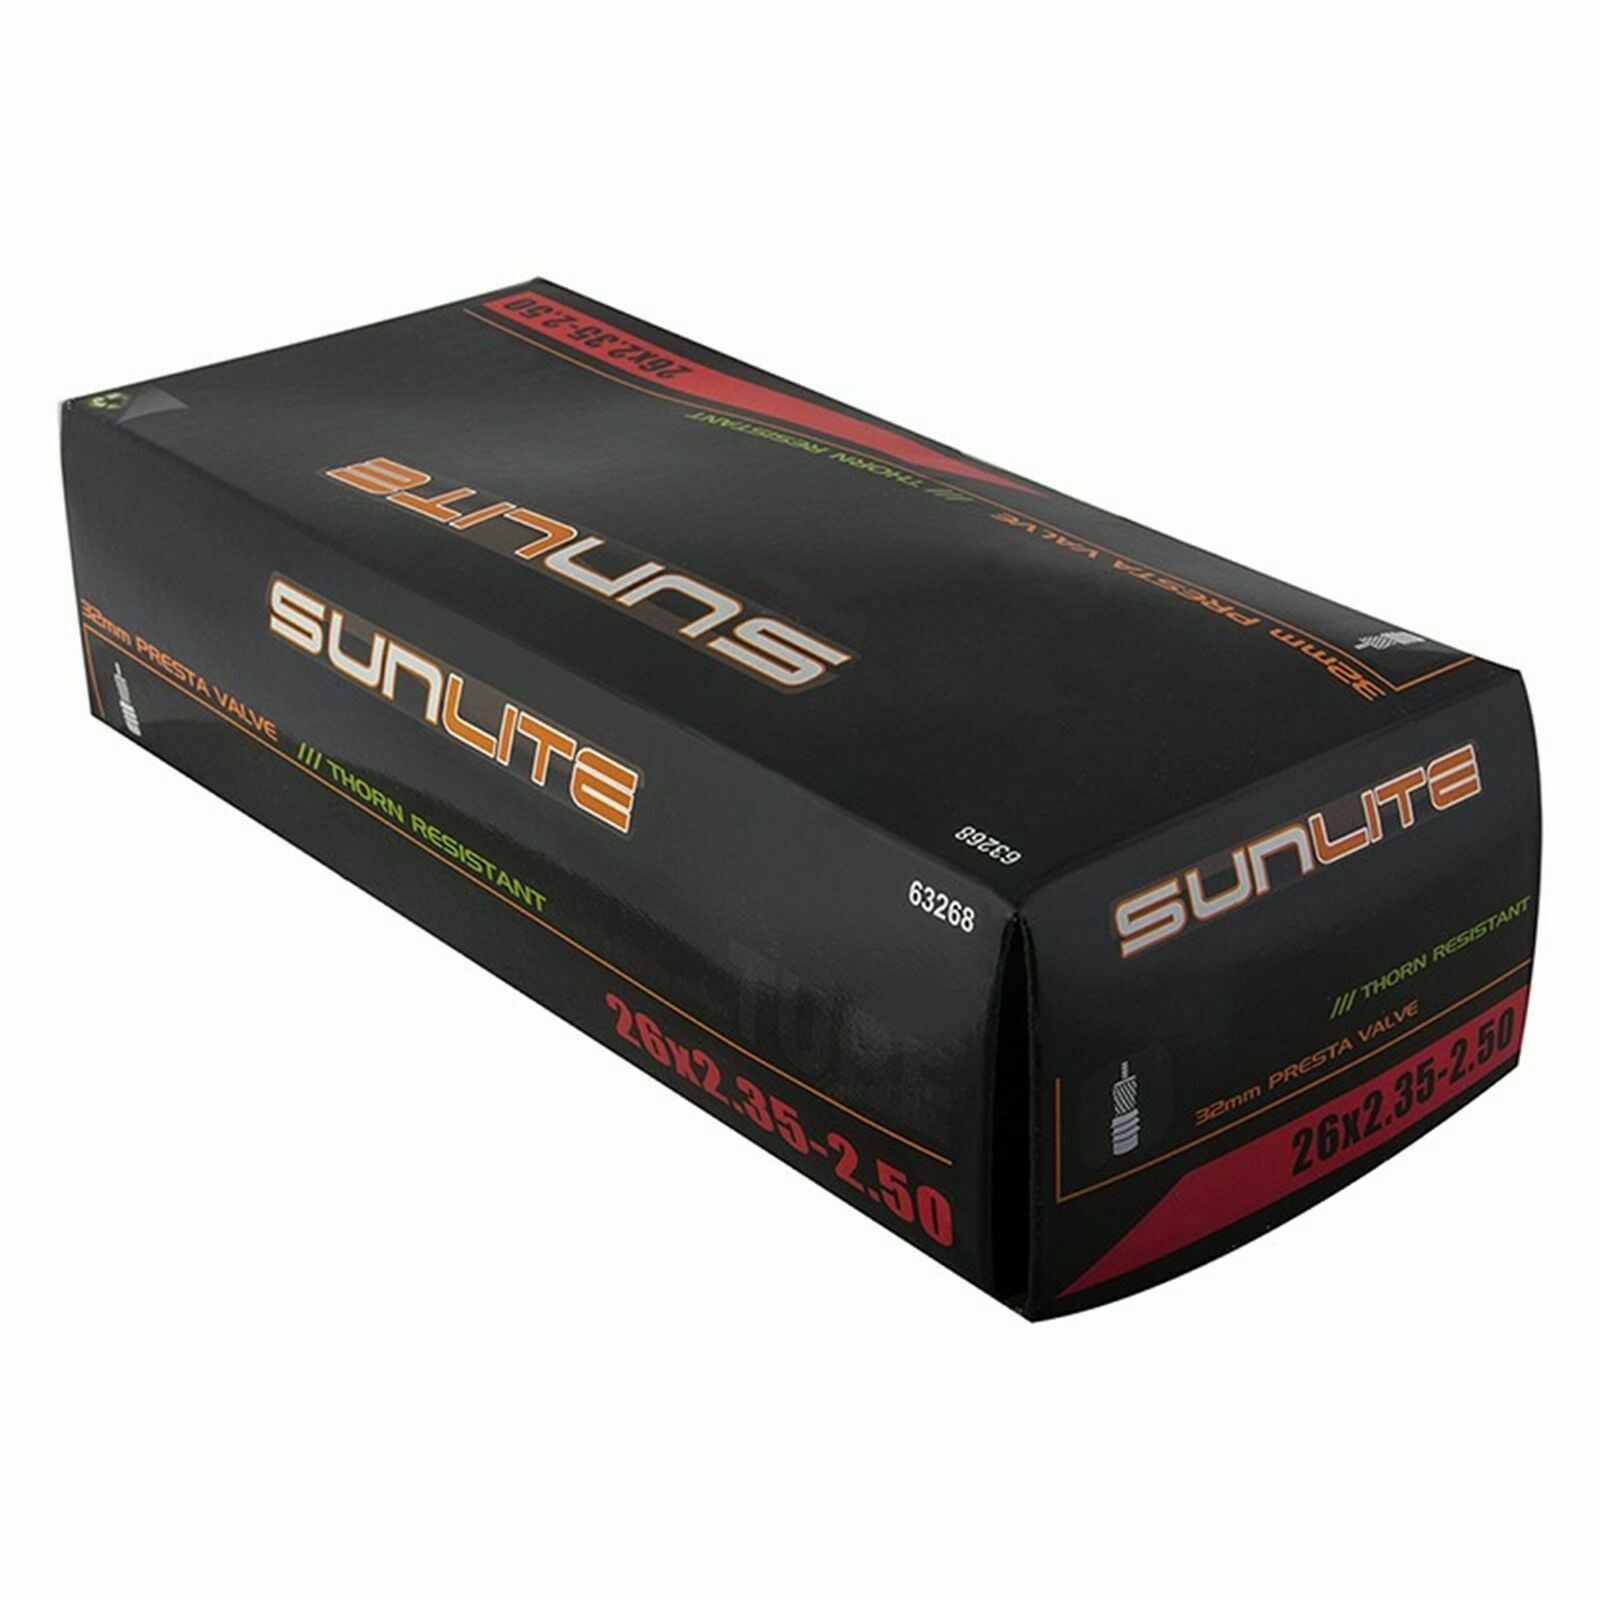 TUBES SUNLT THORN RES PV 32mm 26x2.35-2.50 Sunlite Thorn Resistant Presta Valve